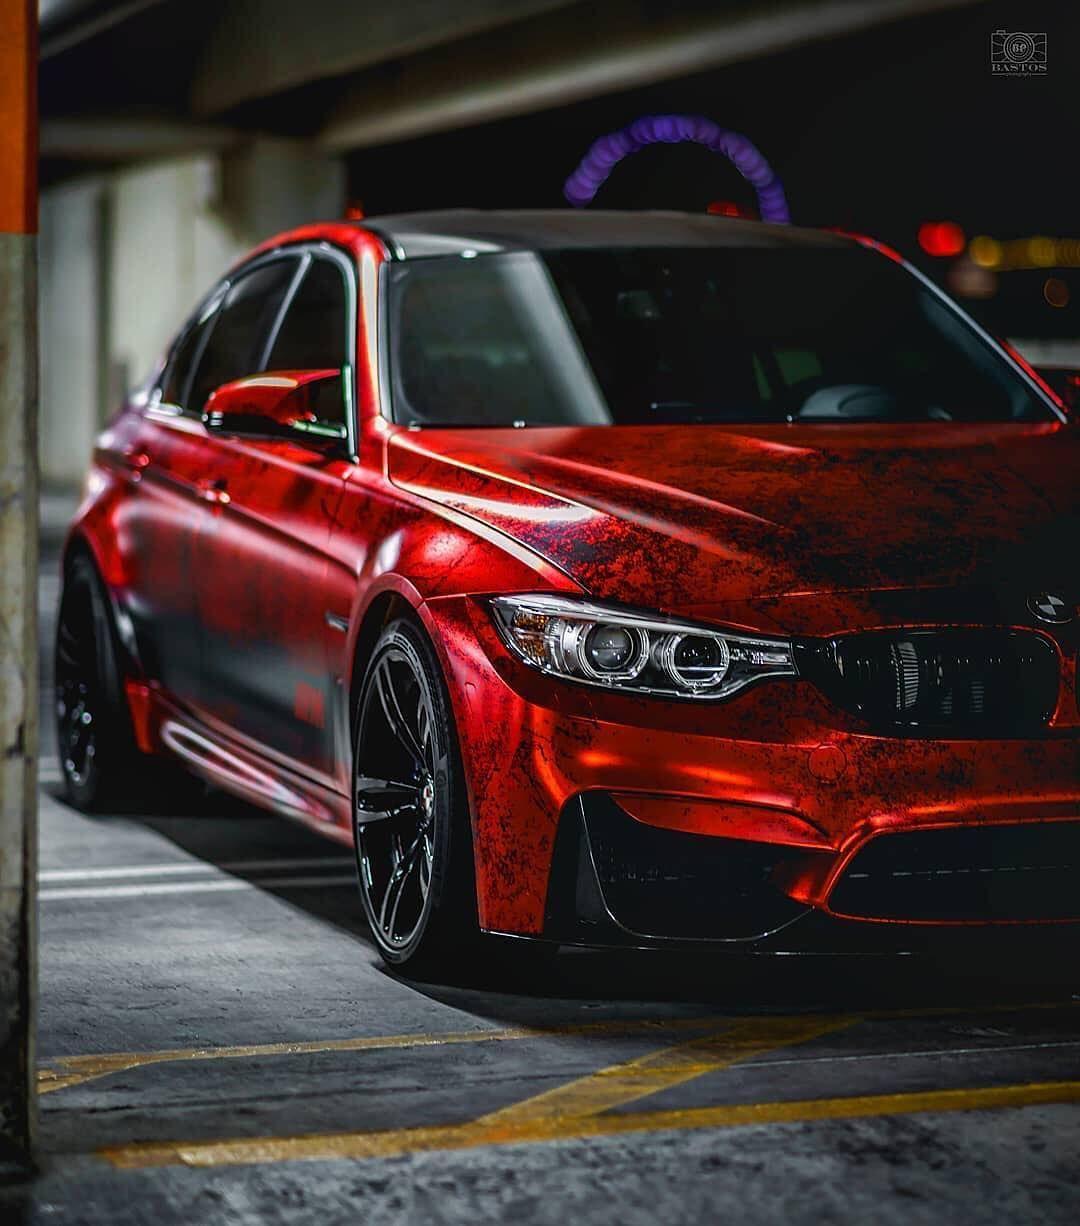 BMW F80 M3 Custom Wrap On Satin Chrome Red Vinyl